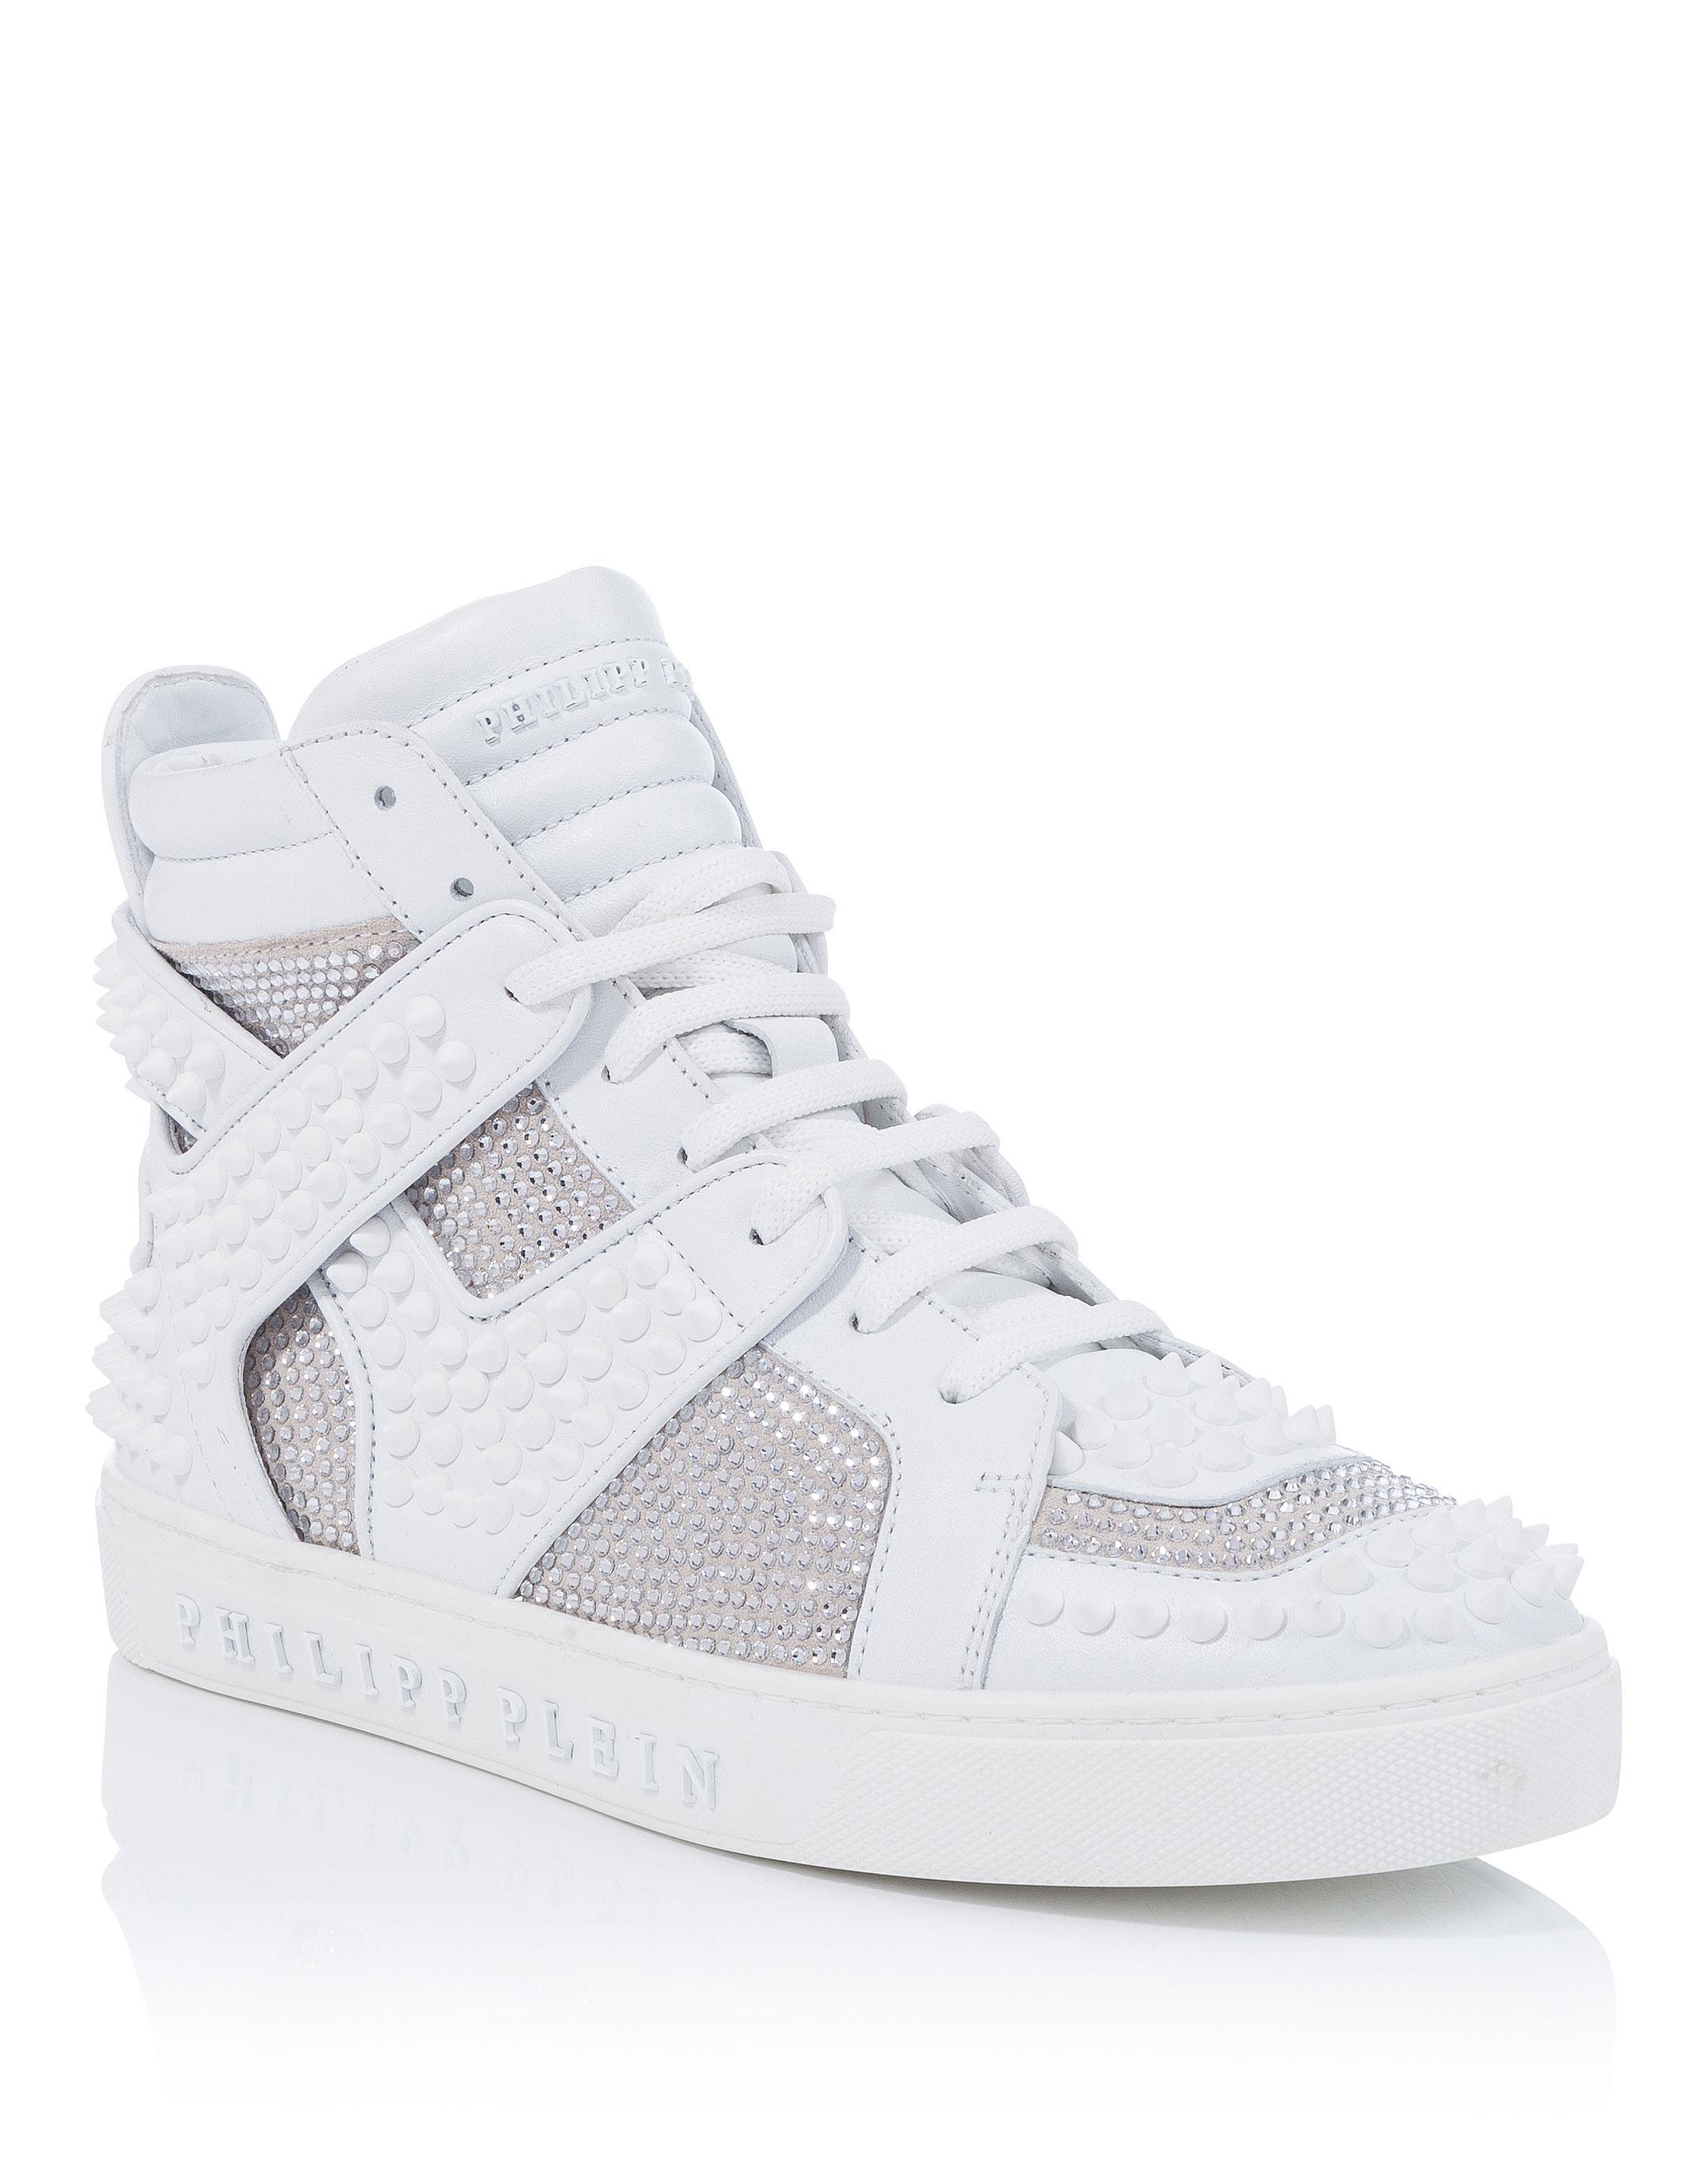 30b33bdabb Philipp Plein Hi-Top Sneakers